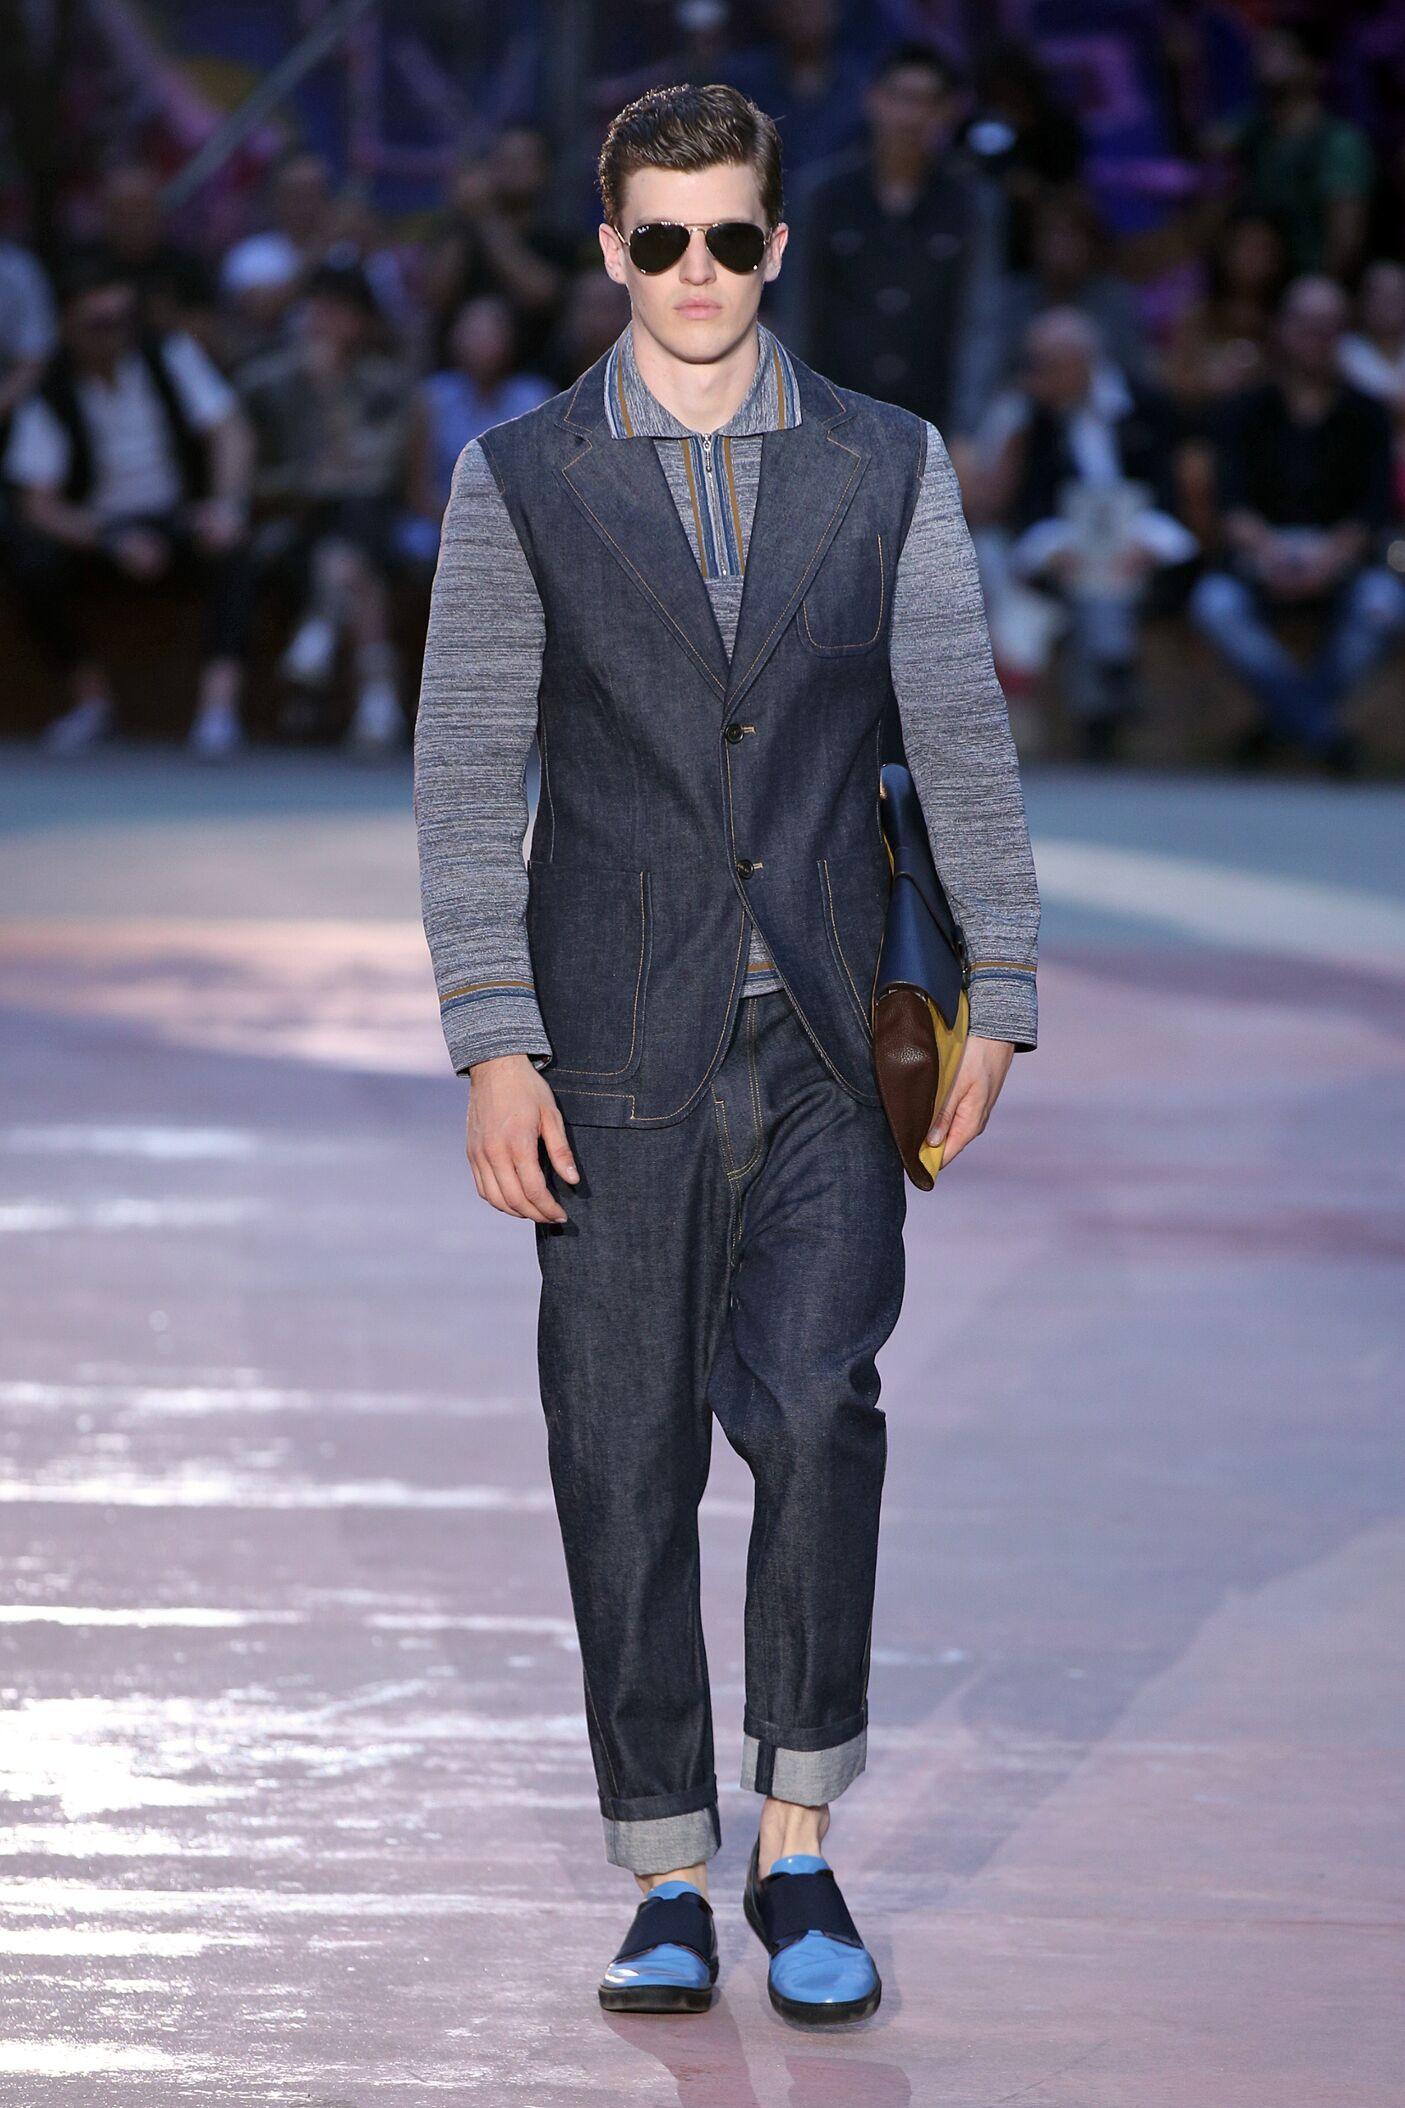 Antonio Marras Spring Summer 2015 Mens Collection Milan Fashion Week